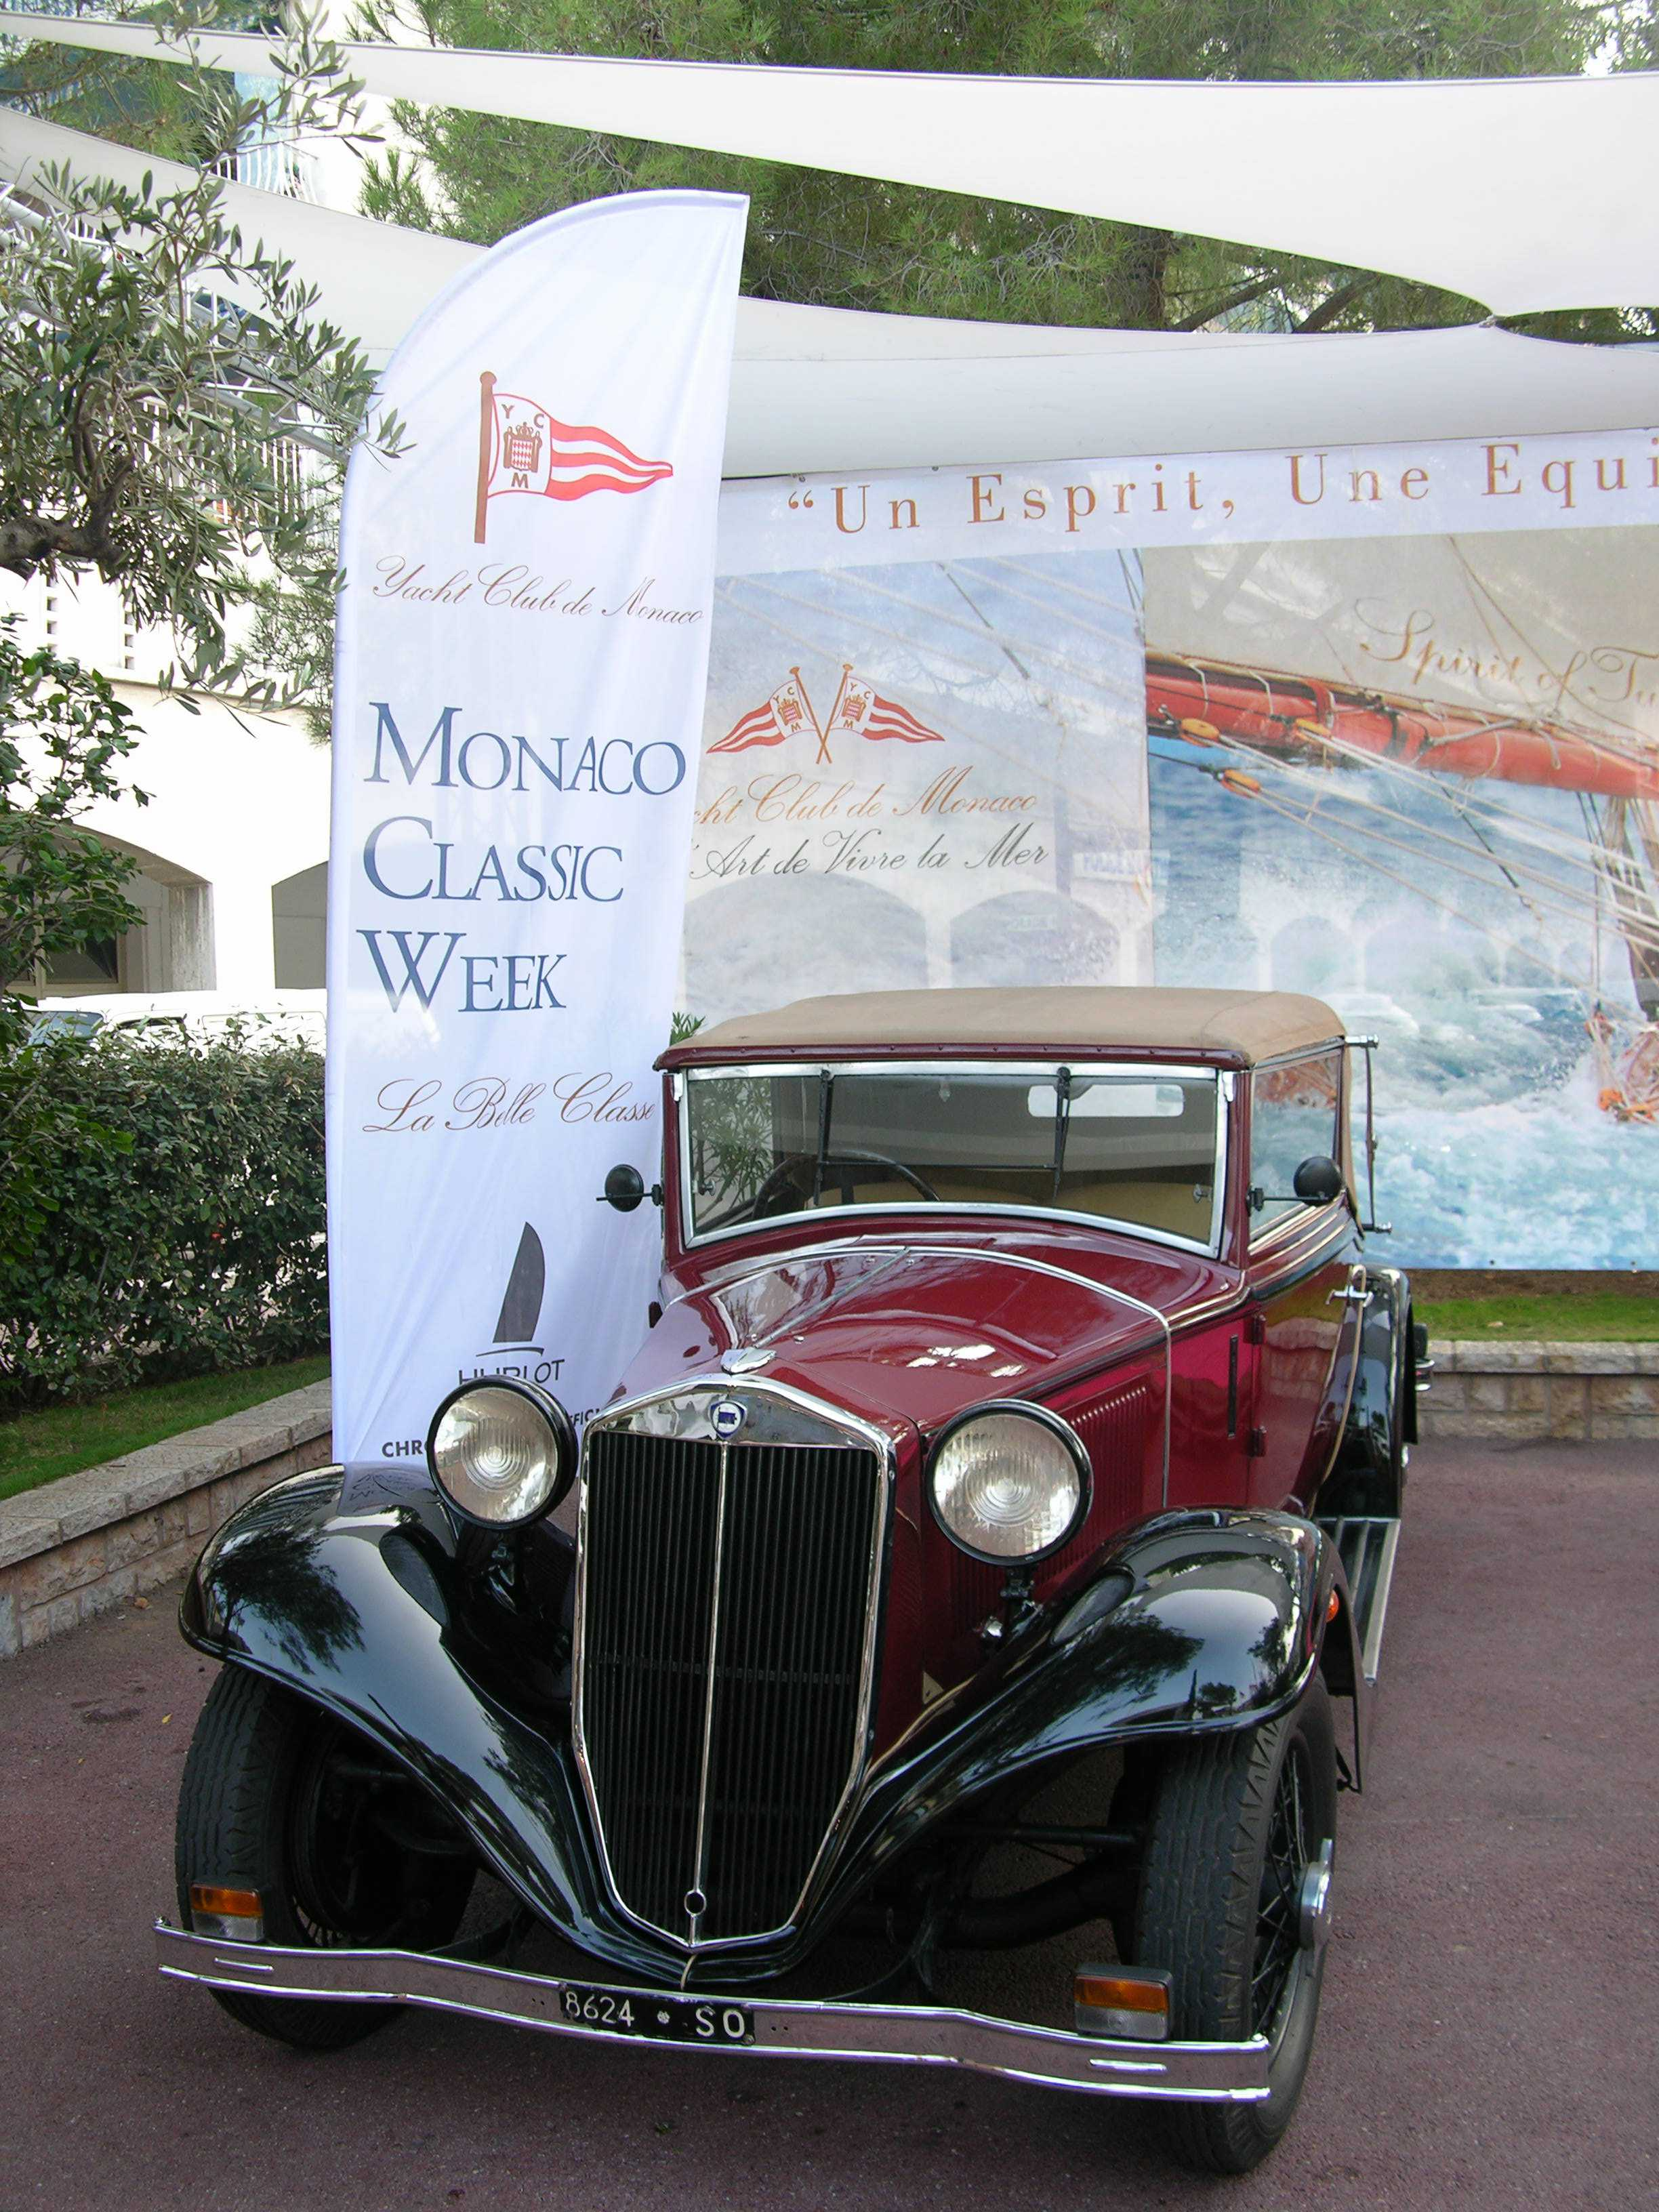 https://s.car.info/image_files/full/lancia-artena-cabriolet-front-side-0-209445.jpg